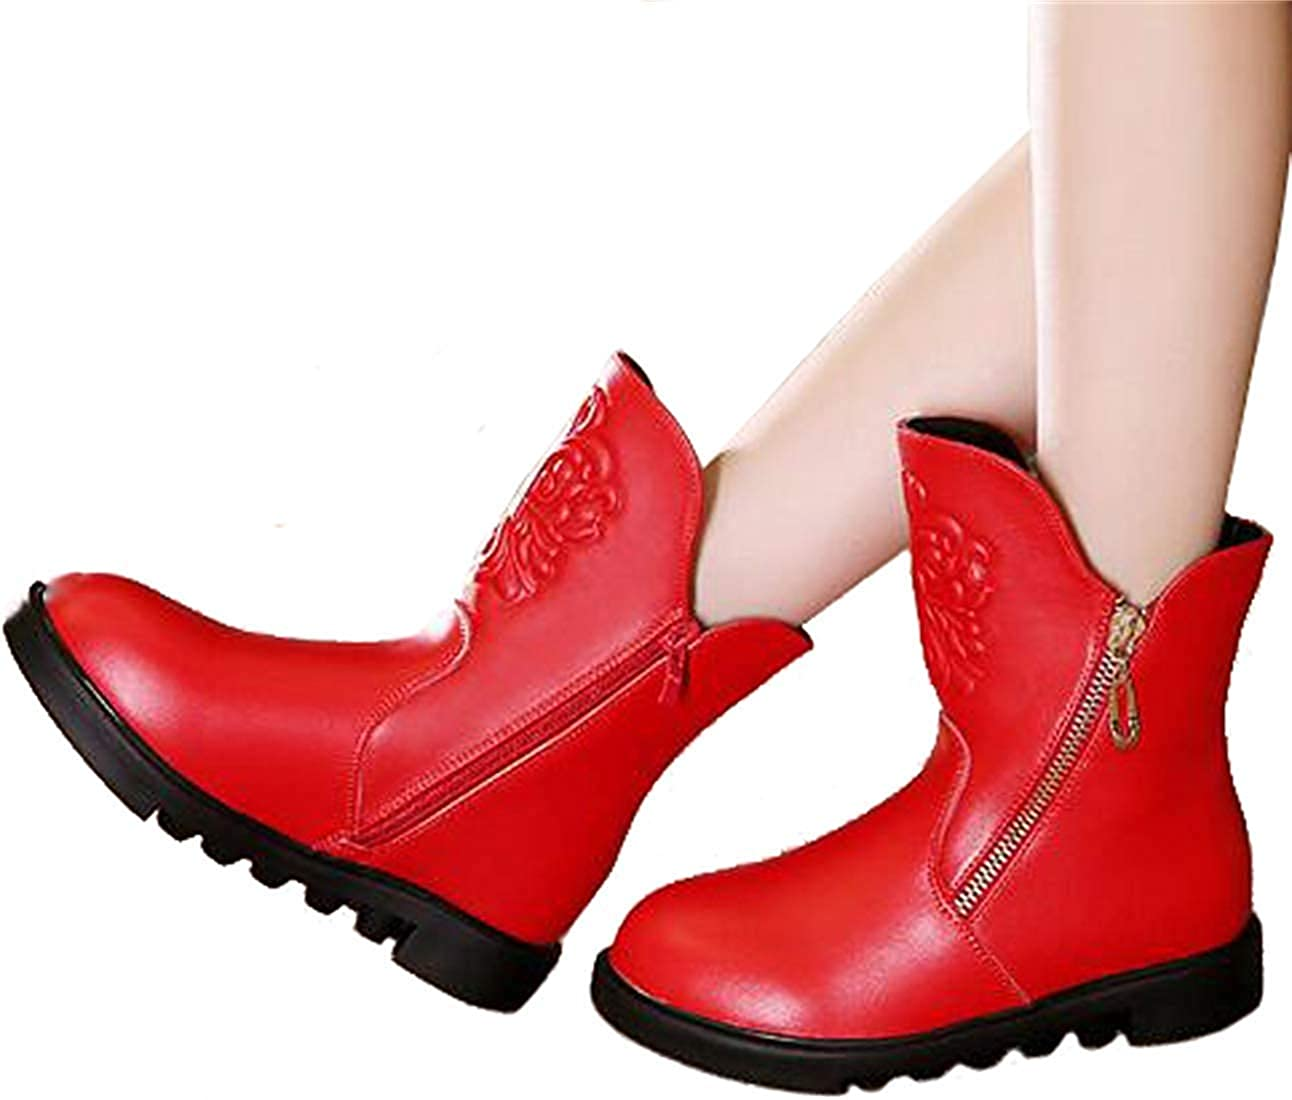 MOREMOO Girls Outdoor Waterproof Side Zip Short Riding Boots Snow Boots